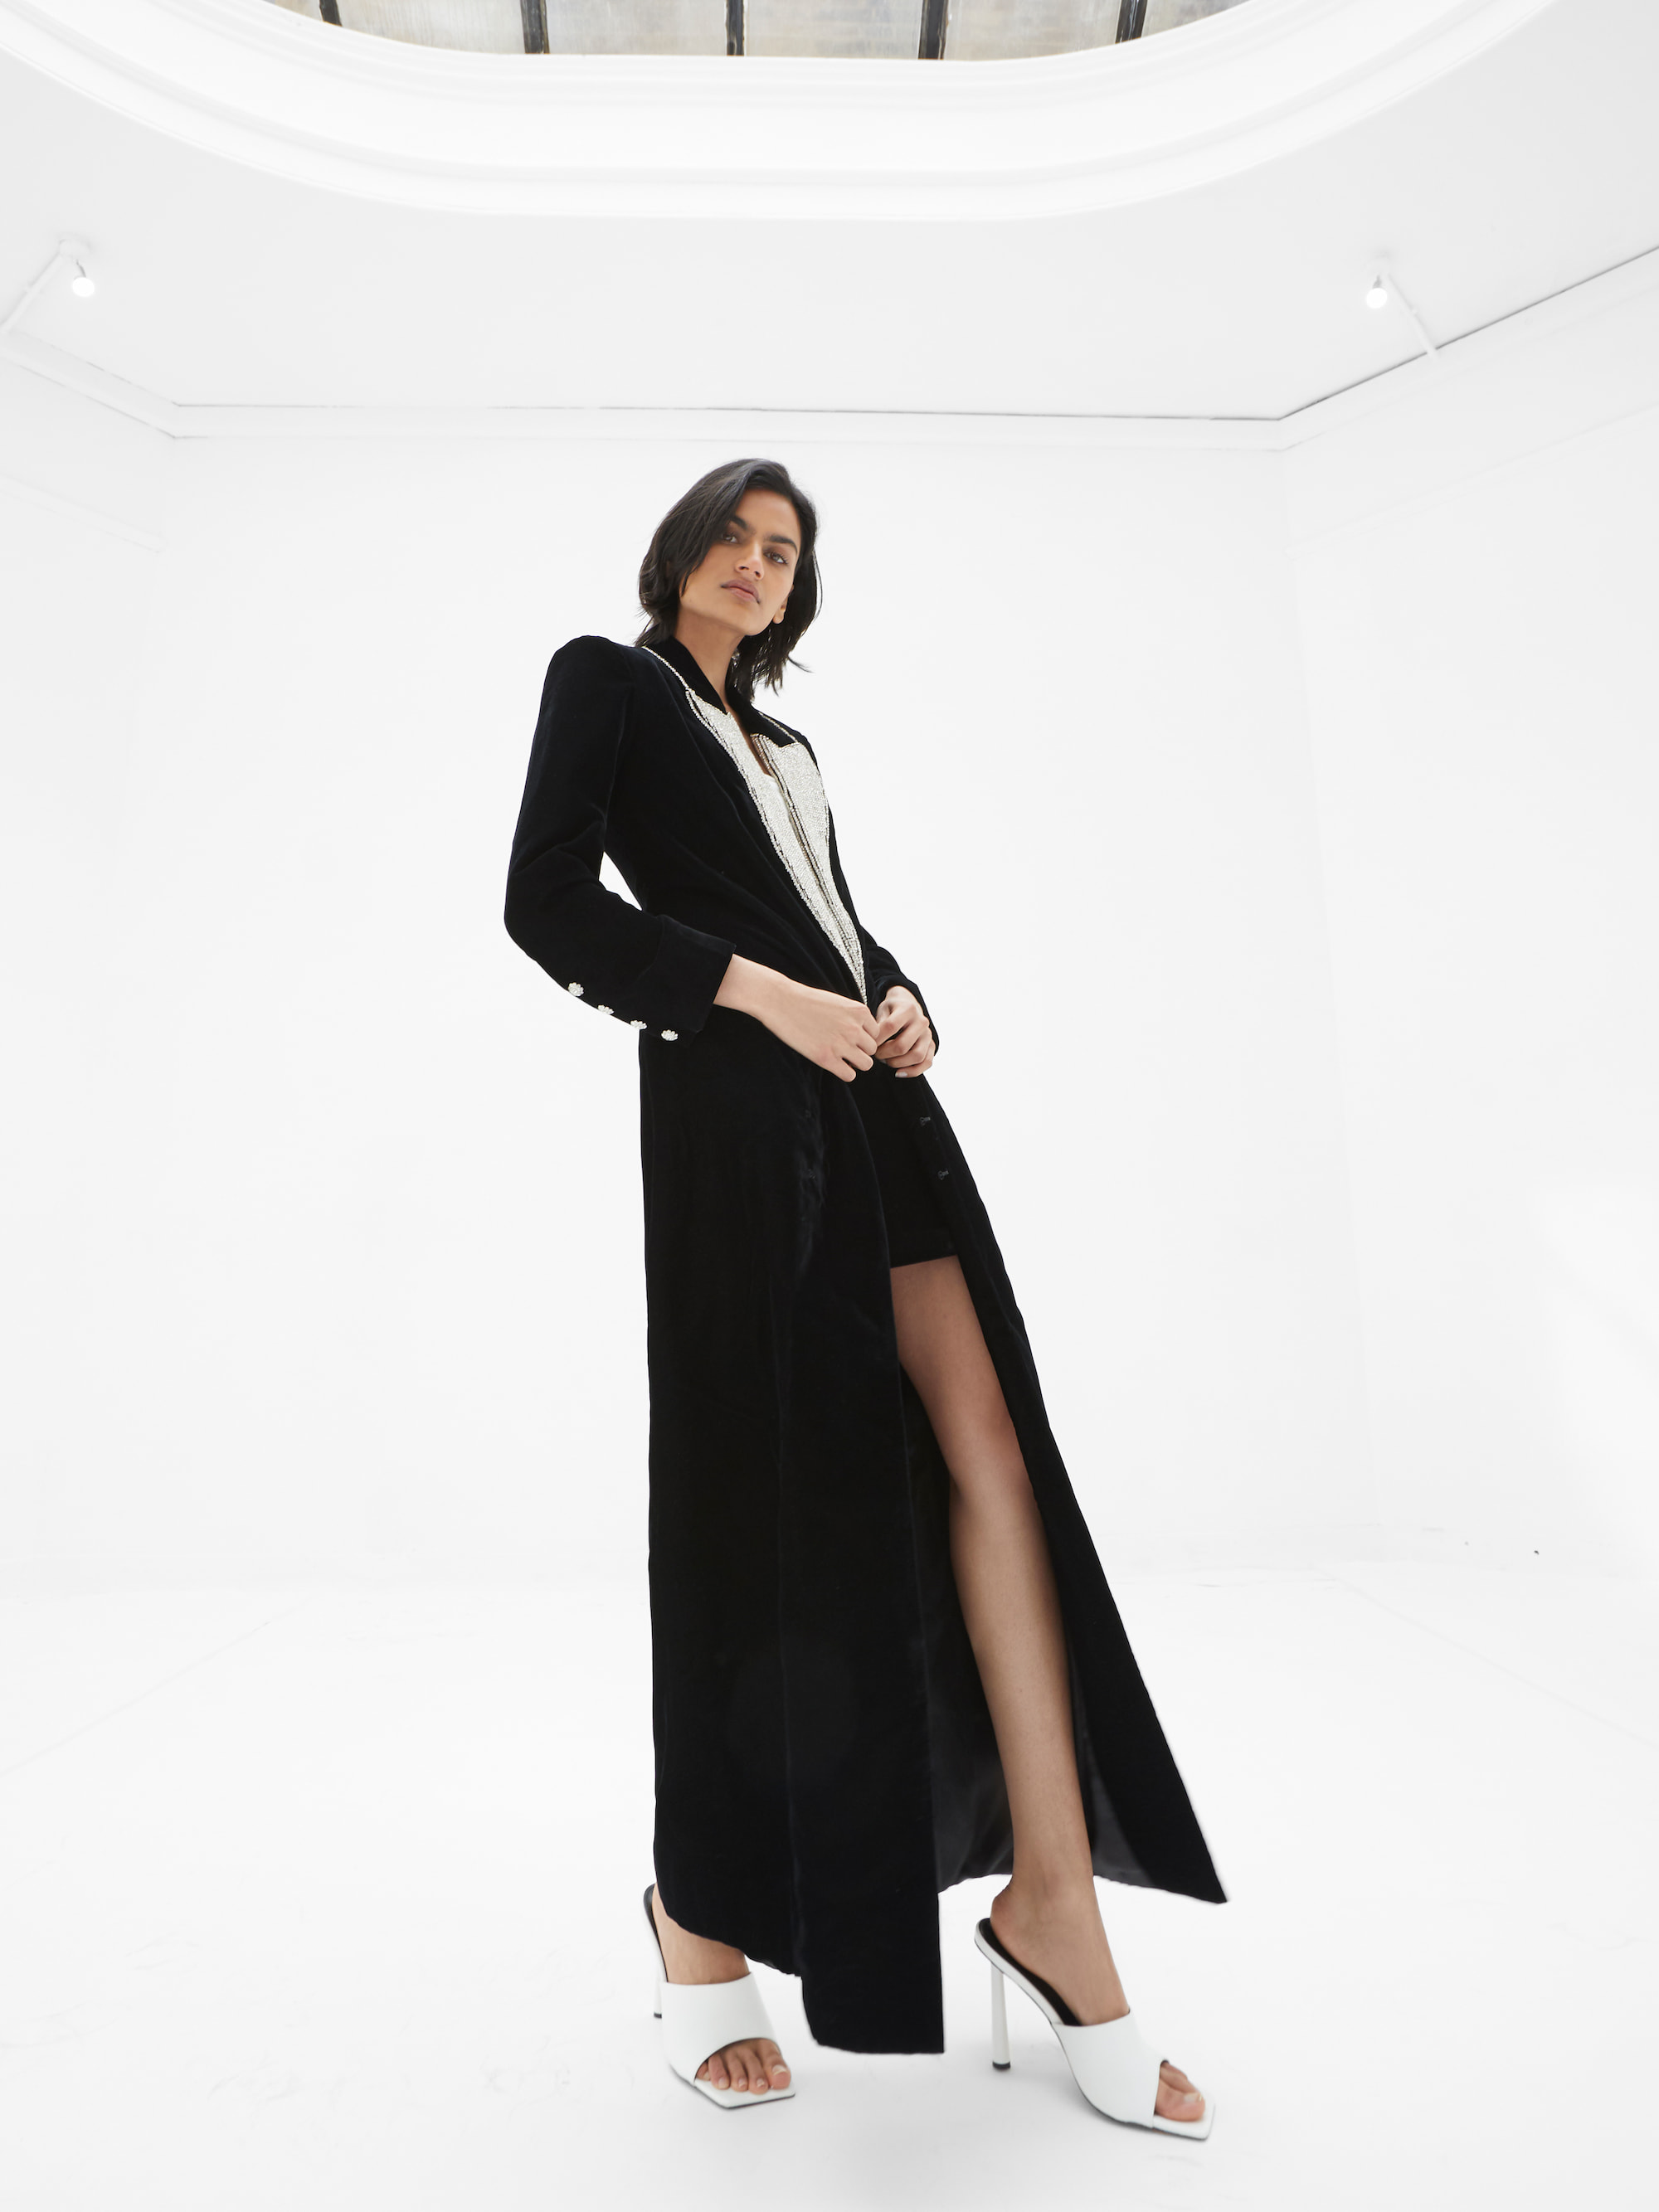 View 5 of model wearing Kalia Kimono in black.